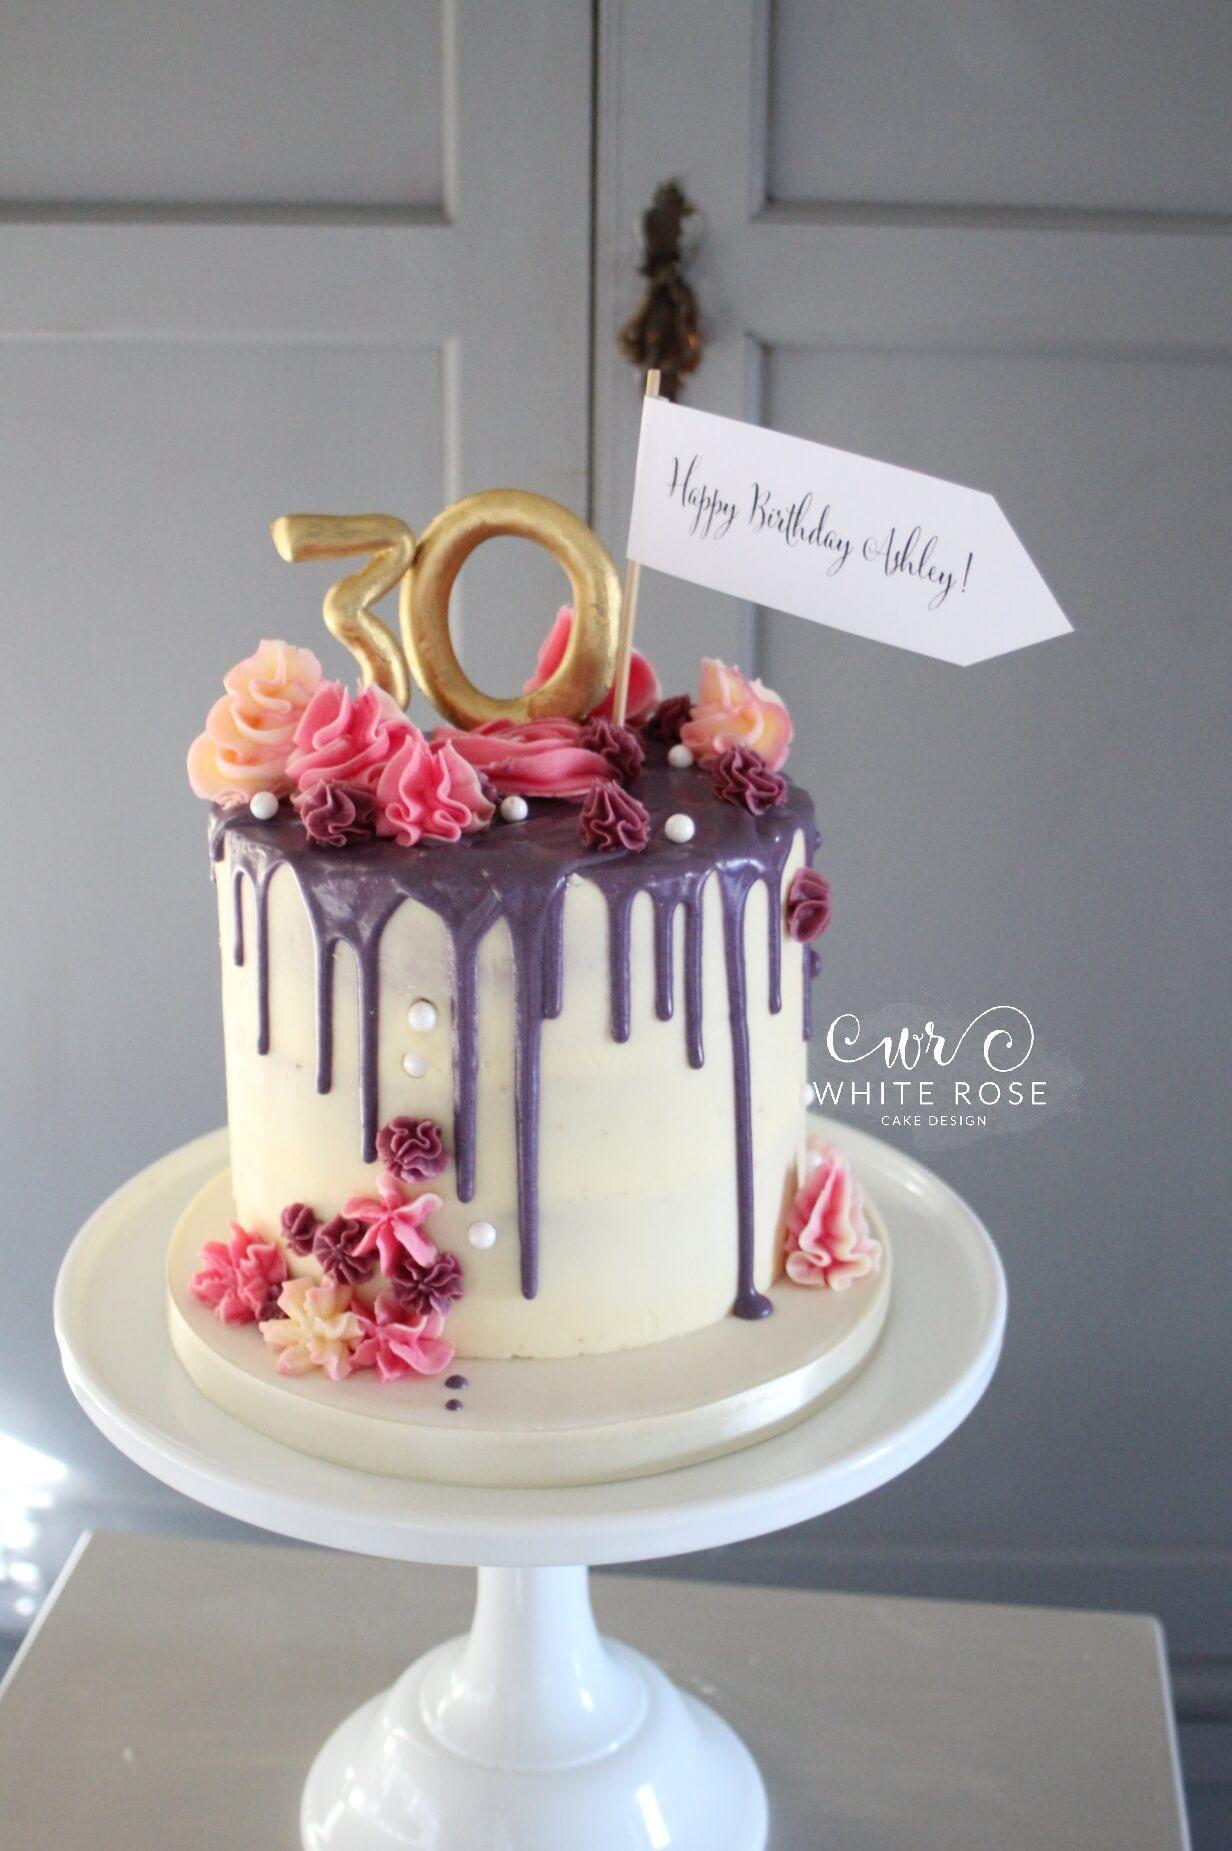 30th Drippy Birthday Cake By White Rose Cake Design 2